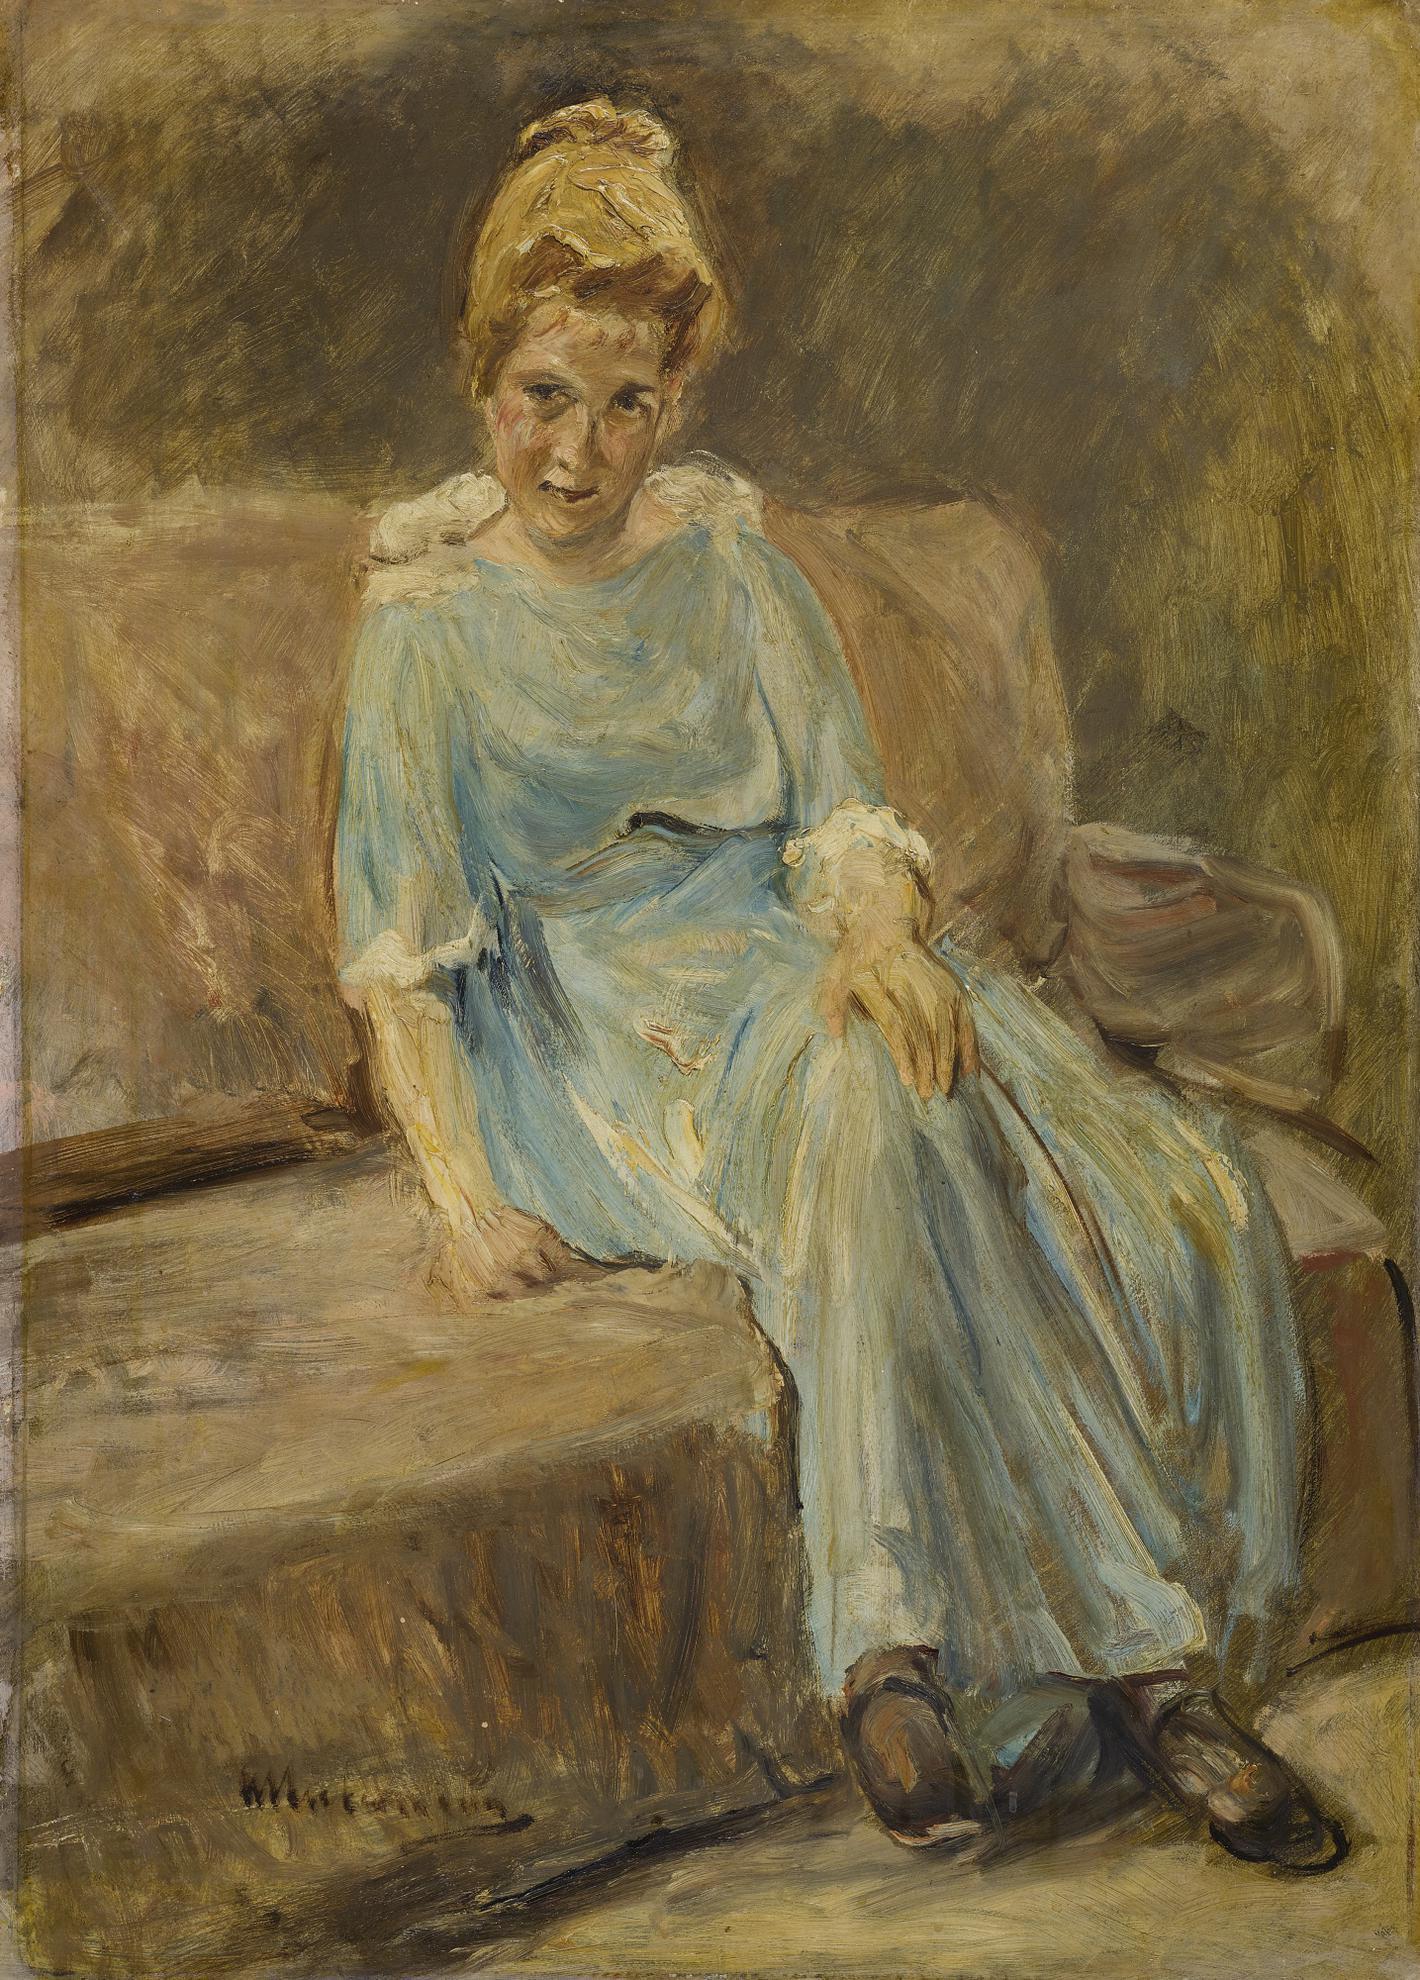 Max Liebermann-Damenbildnis In Blauem Kleid (Portrait Of A Woman In A Blue Dress)-1910